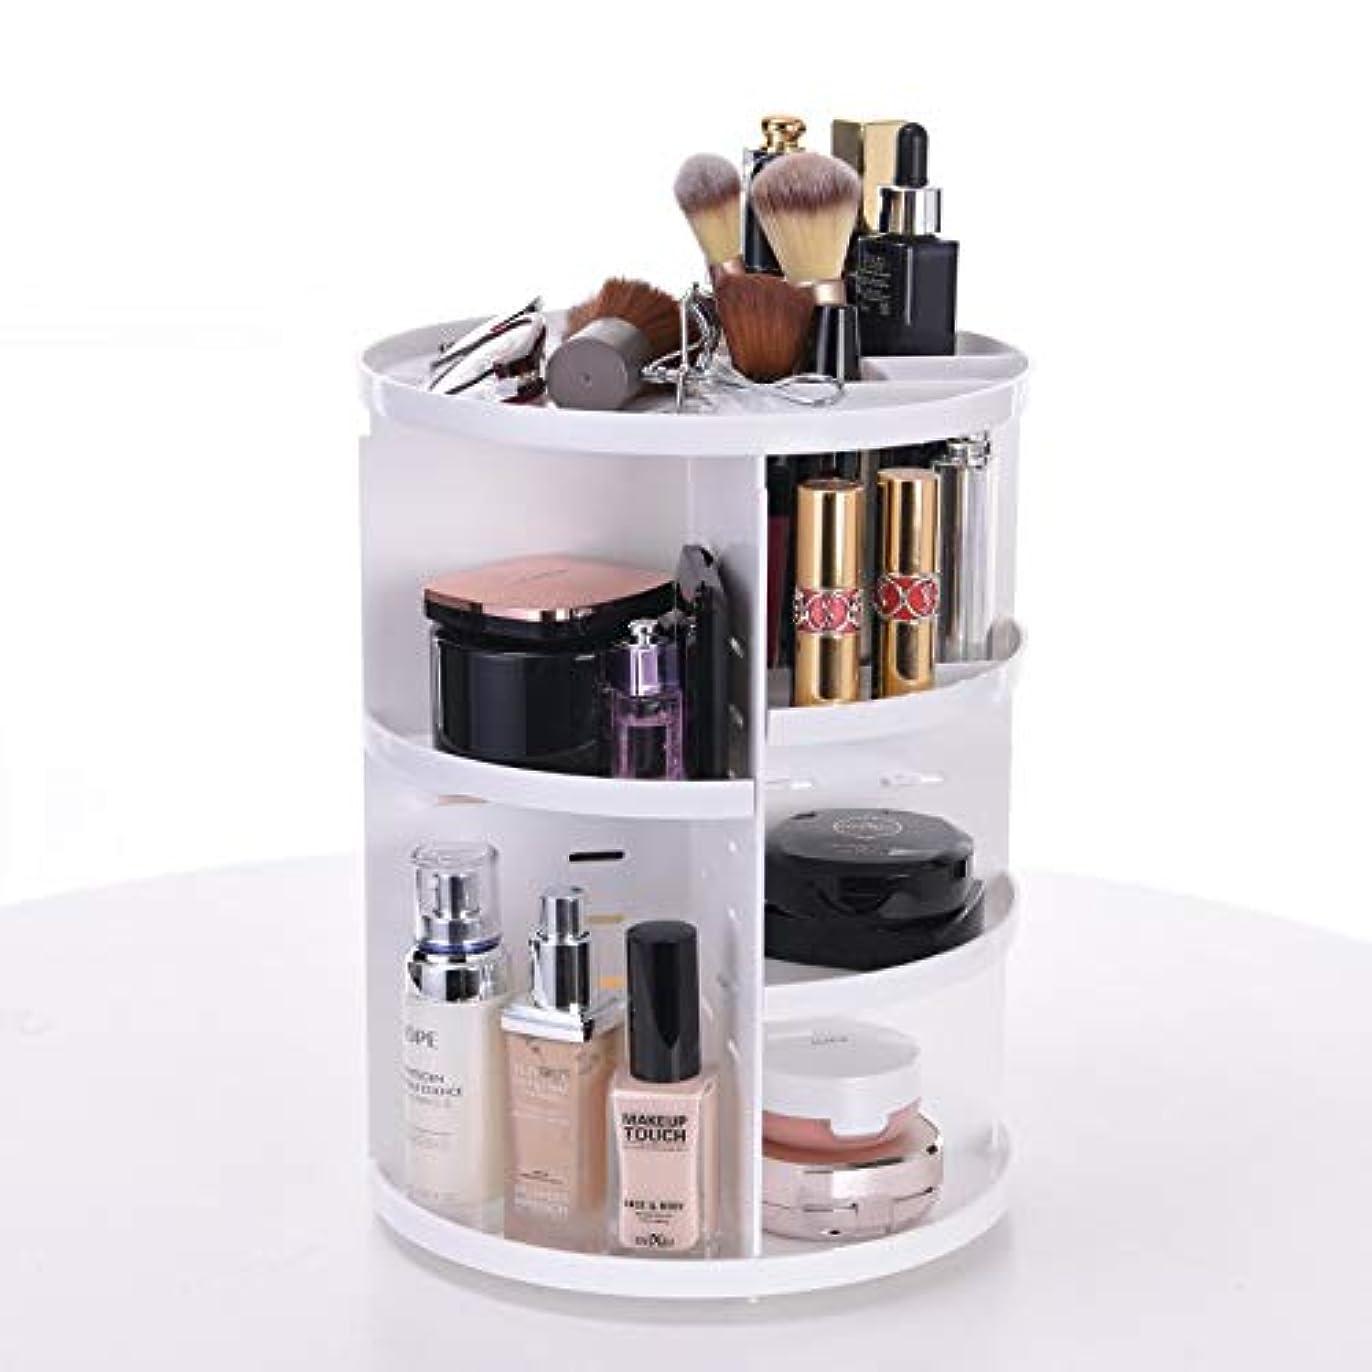 nanaco?化粧品収納ボックス 大容量 360度回転 コスメ収納ボックス 引き出し小物/化粧品入れ コスメ収納スタンド(白)